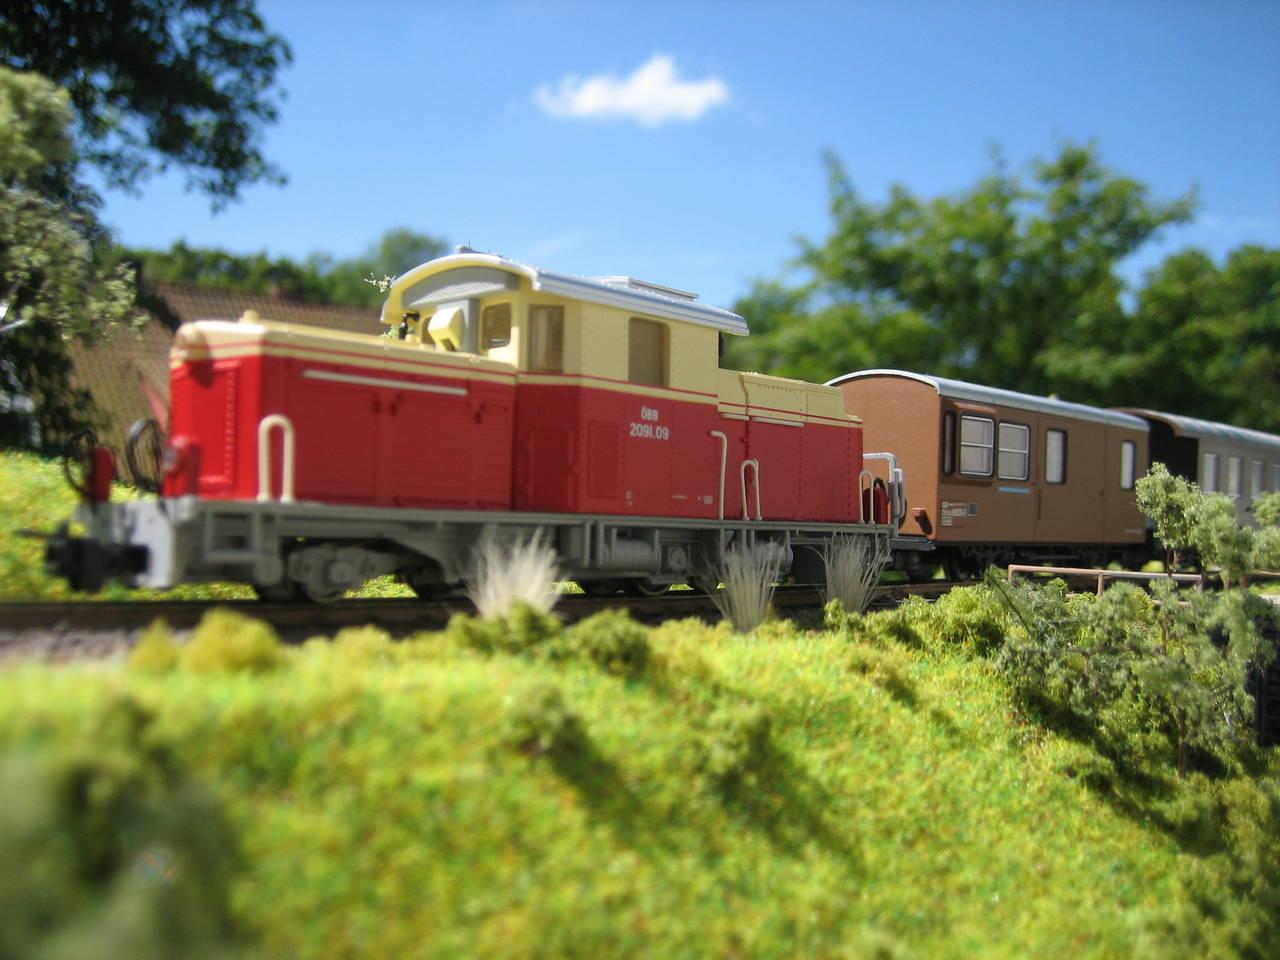 ÖBB BR 2091 rot-beige